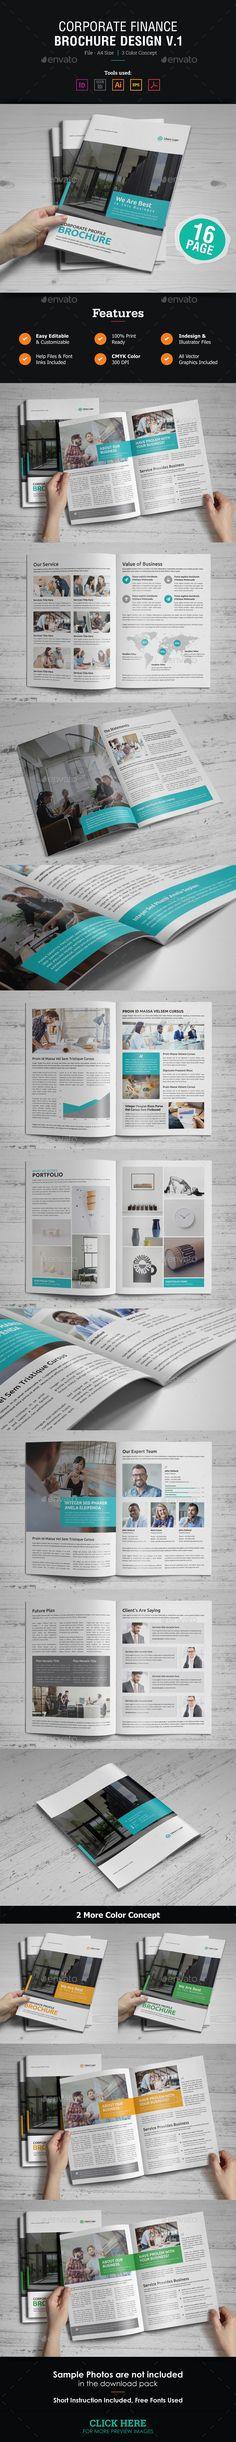 Check out Corporate Brochure on #EnvatoMarket #graphicriver https://graphicriver.net/item/corporate-brochure-design/21182687? @EnvatoMarket #envato #Portfolio #EnvatoMarket #flyer #brochure #catalog #booklet #banner #graphicdesign #behance #dribble #webdesign #wordpress #coding #ui #proposal #magazine #print #design